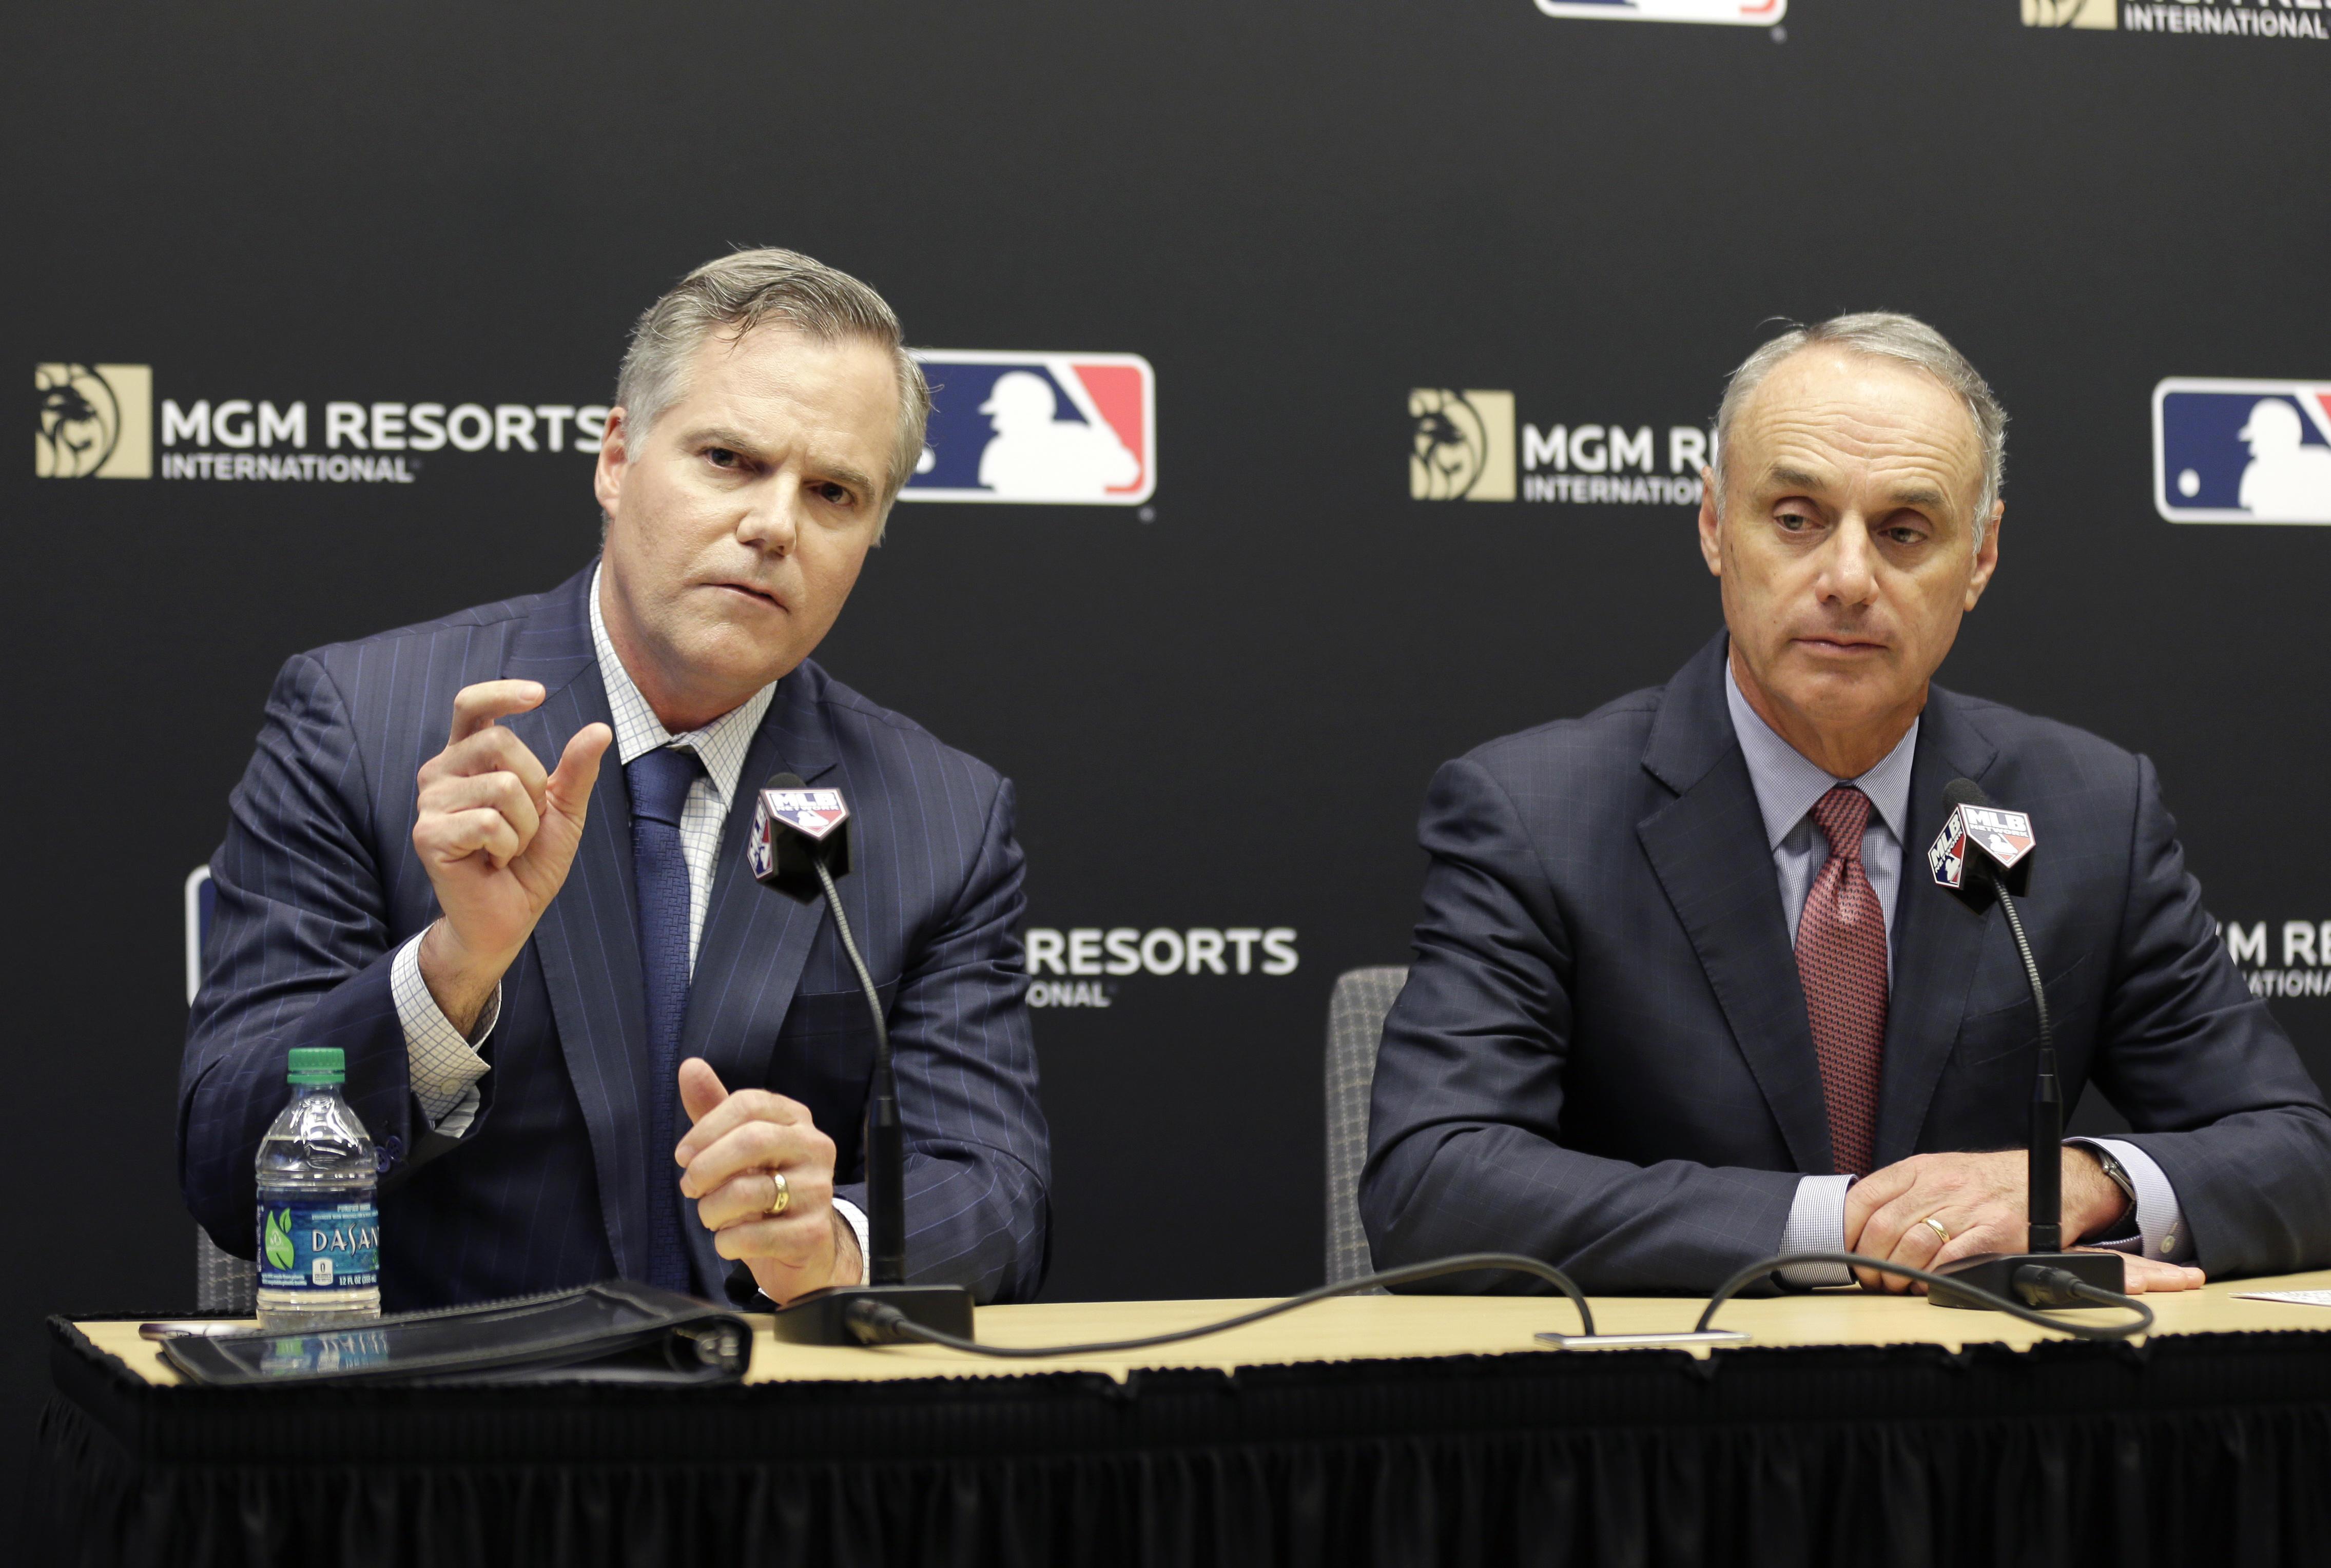 MGM MLB betting partnership